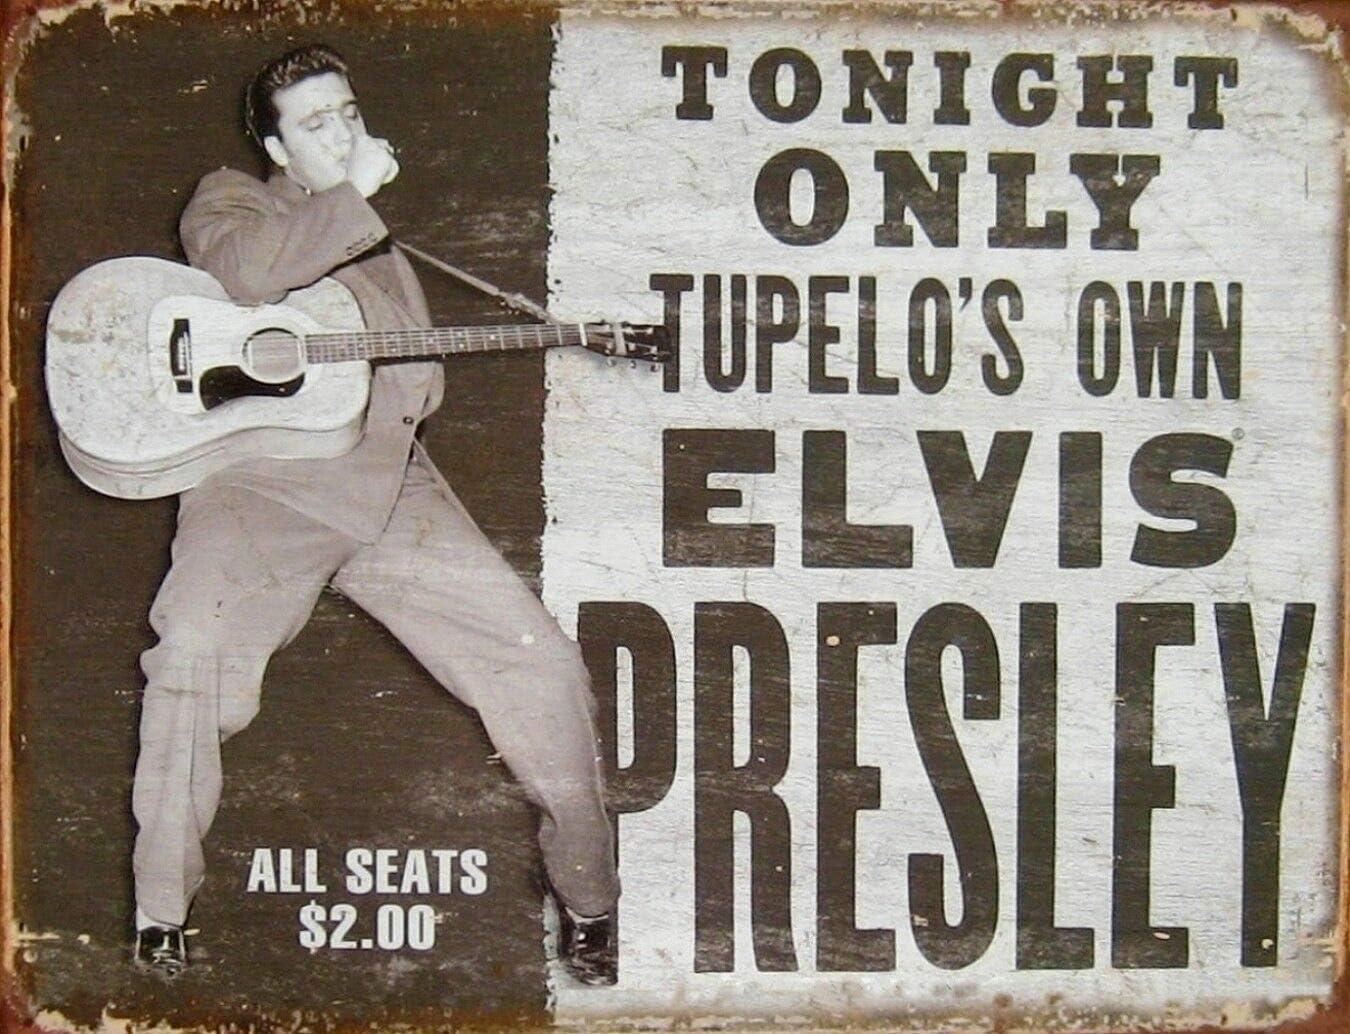 Hunnry Elvis Presley Tonight Only Poster Metall Blechschilder Retro Dekoration Schild Aluminium Blechwaren Vintage Wandkunstplakat Zum Cafe Bar Wohnzimmer Zuhause